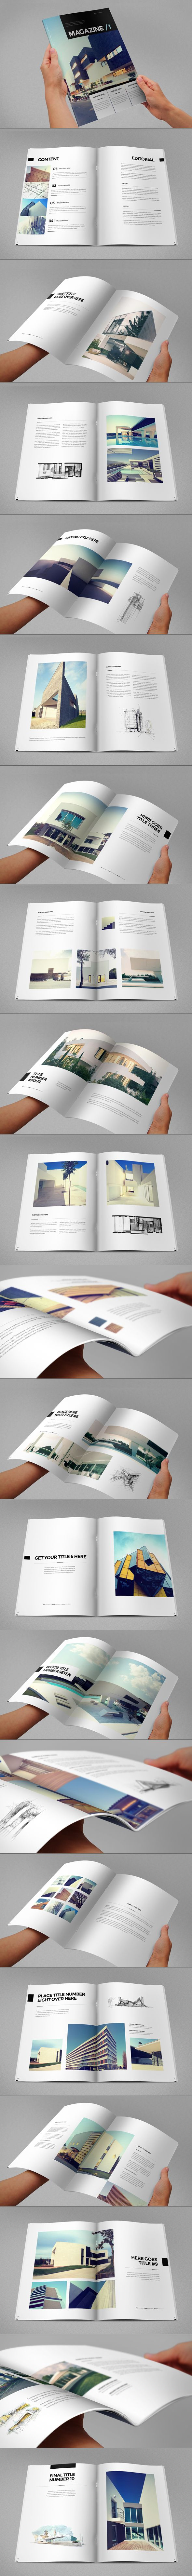 Architecture Minimal Magazine. Download here: http://graphicriver.net/item/architecture-minimal-magazine/6982340?ref=abradesign #magazine #design #architecture #portfolio